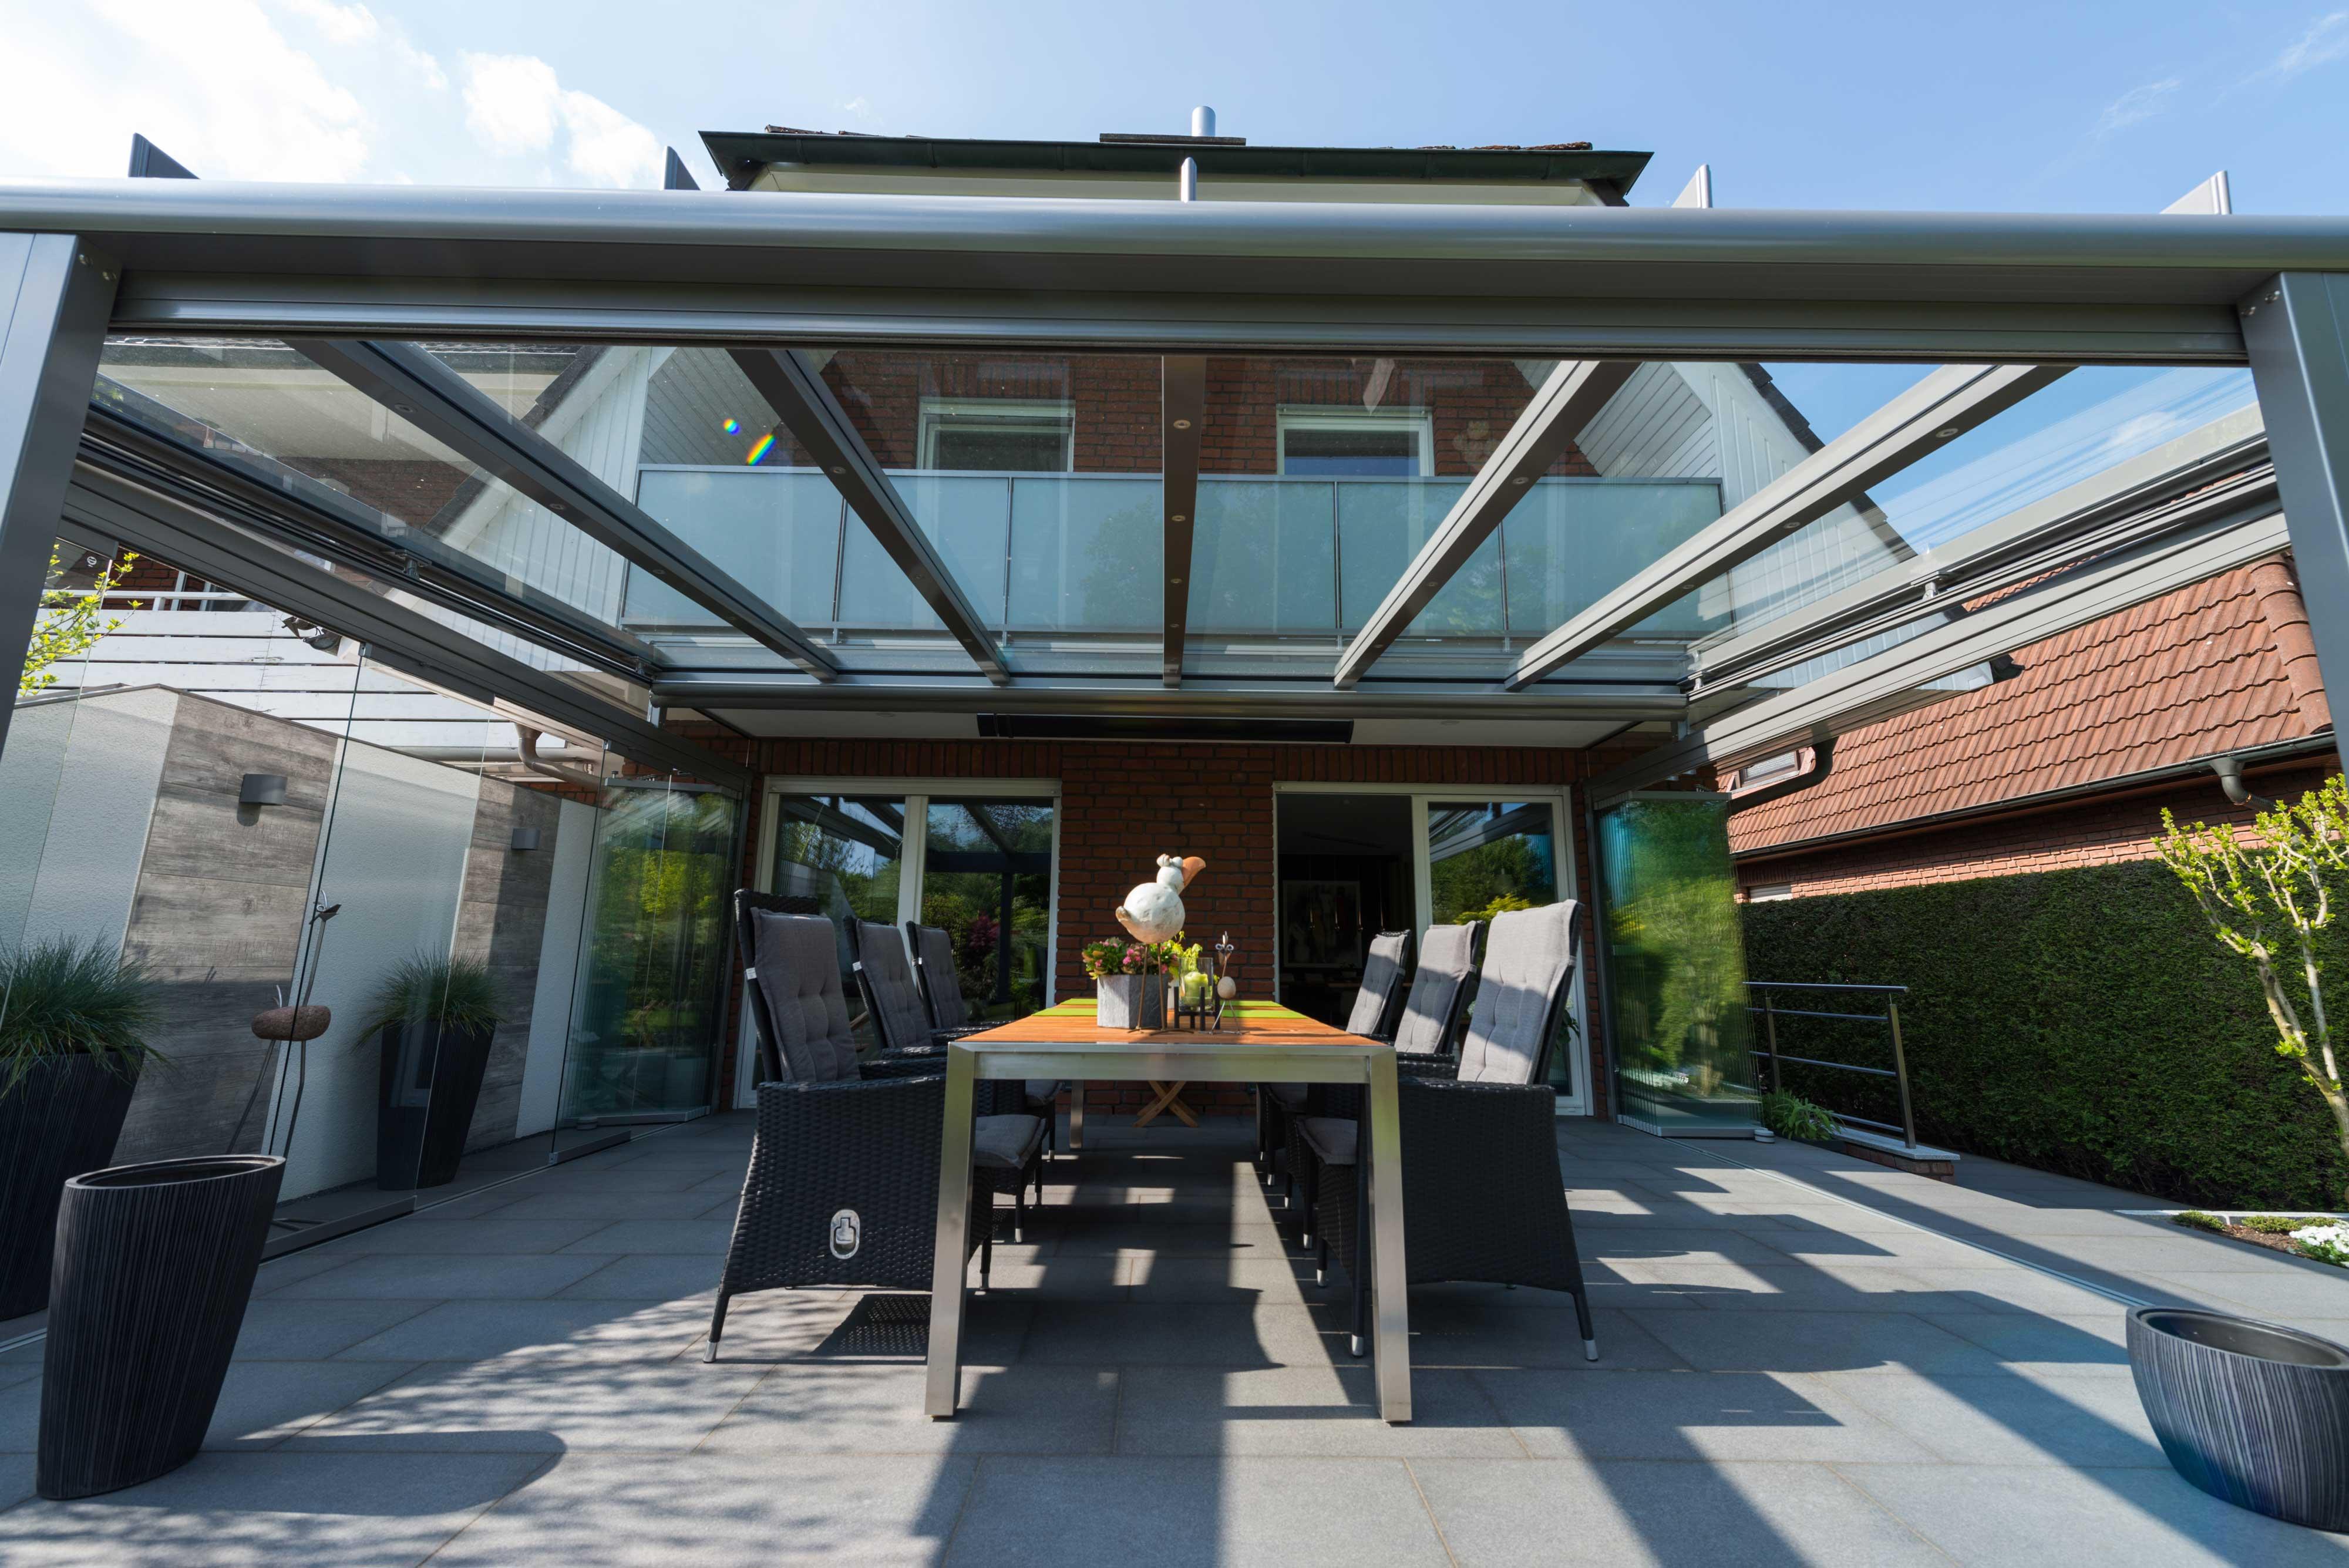 solarlux glashaus in hamburg schulze braak. Black Bedroom Furniture Sets. Home Design Ideas